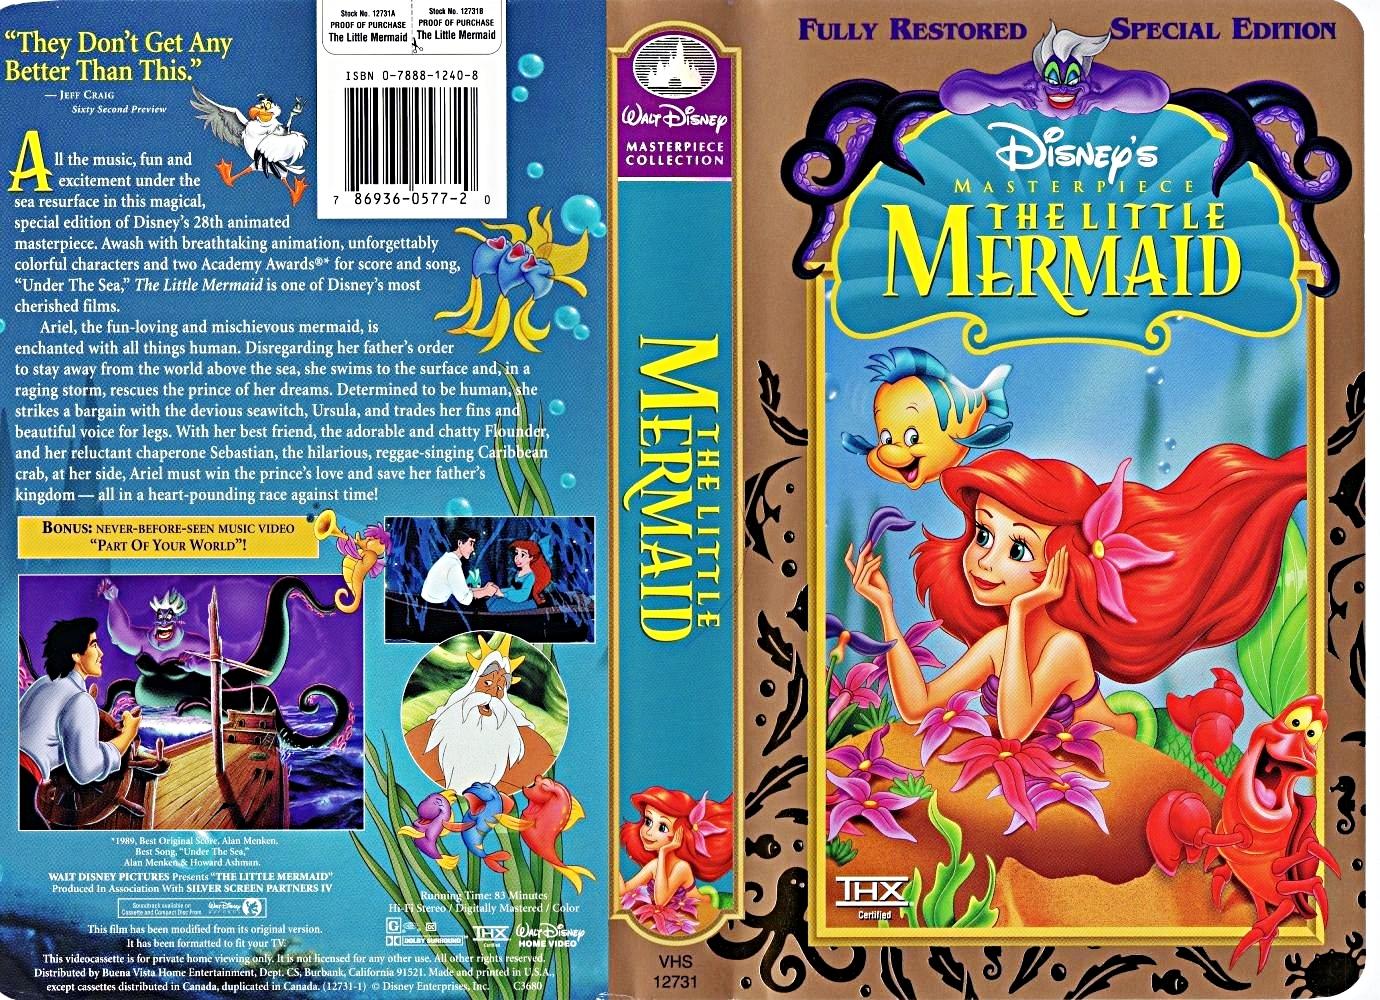 what version of  u0026quot the little mermaid u0026quot  do  ub2f9 uc2e0 own